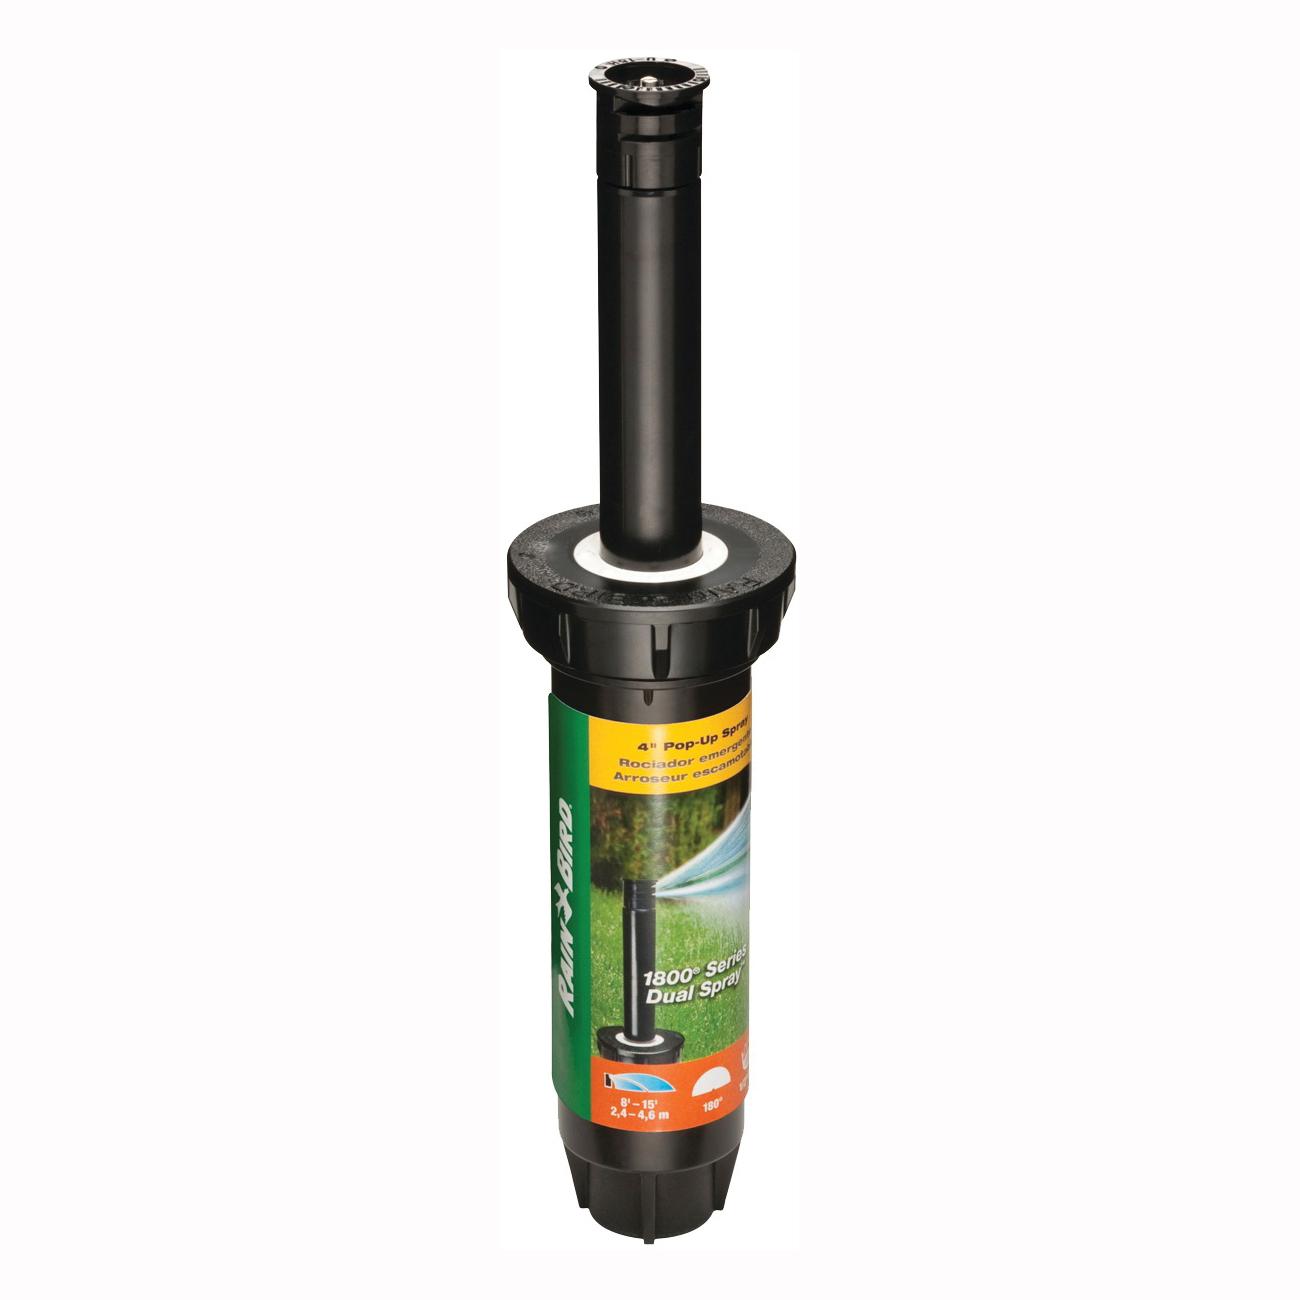 Picture of Rain Bird 1804HDS Spray Head Sprinkler, 1/2 in Connection, FNPT, Plastic